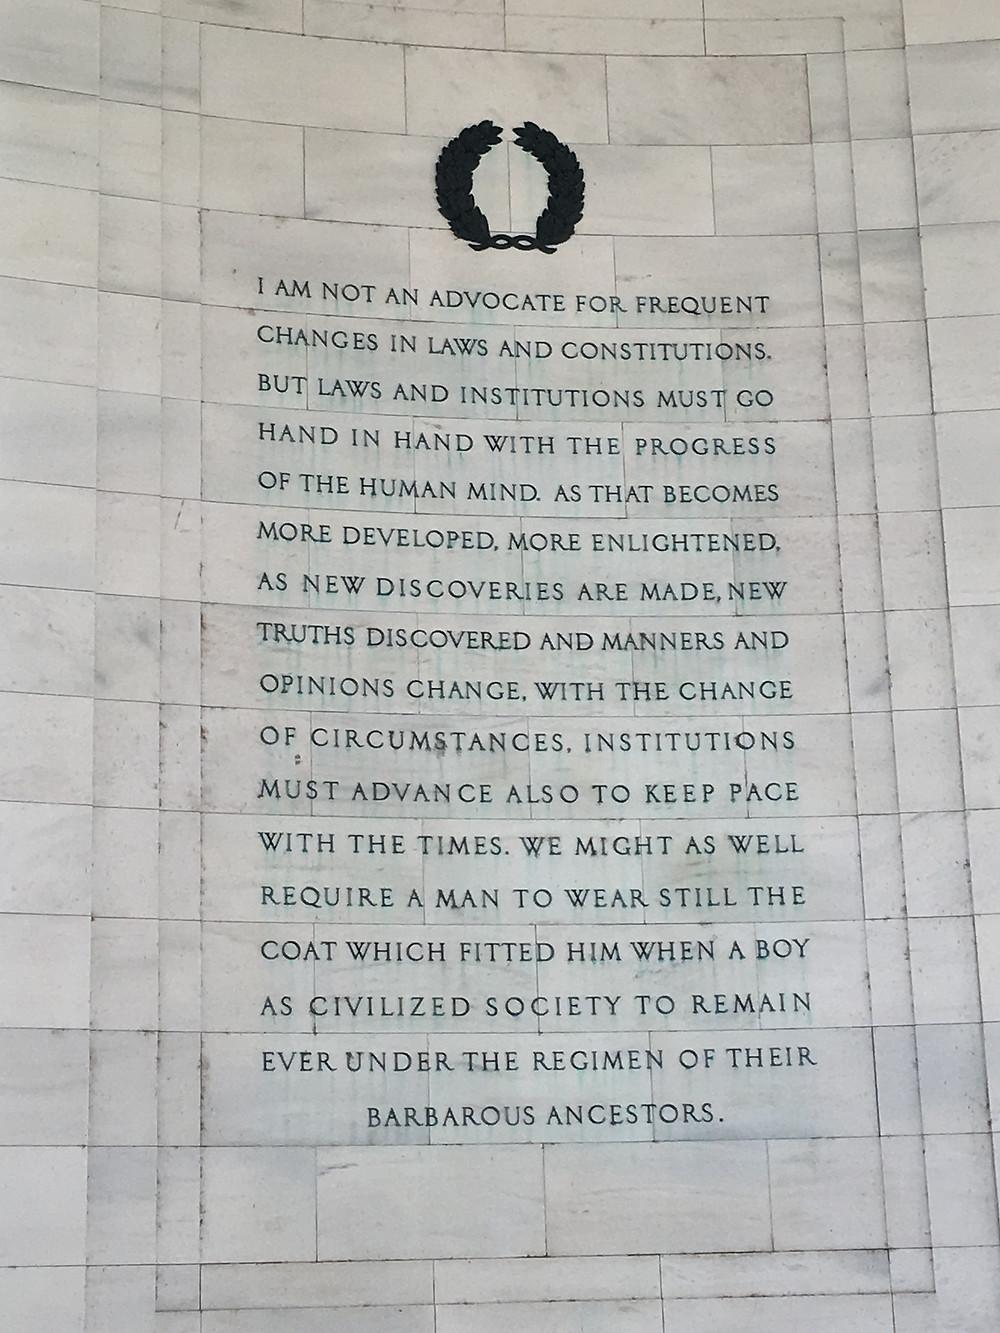 The Jefferson Memorial in Washington, D.C.